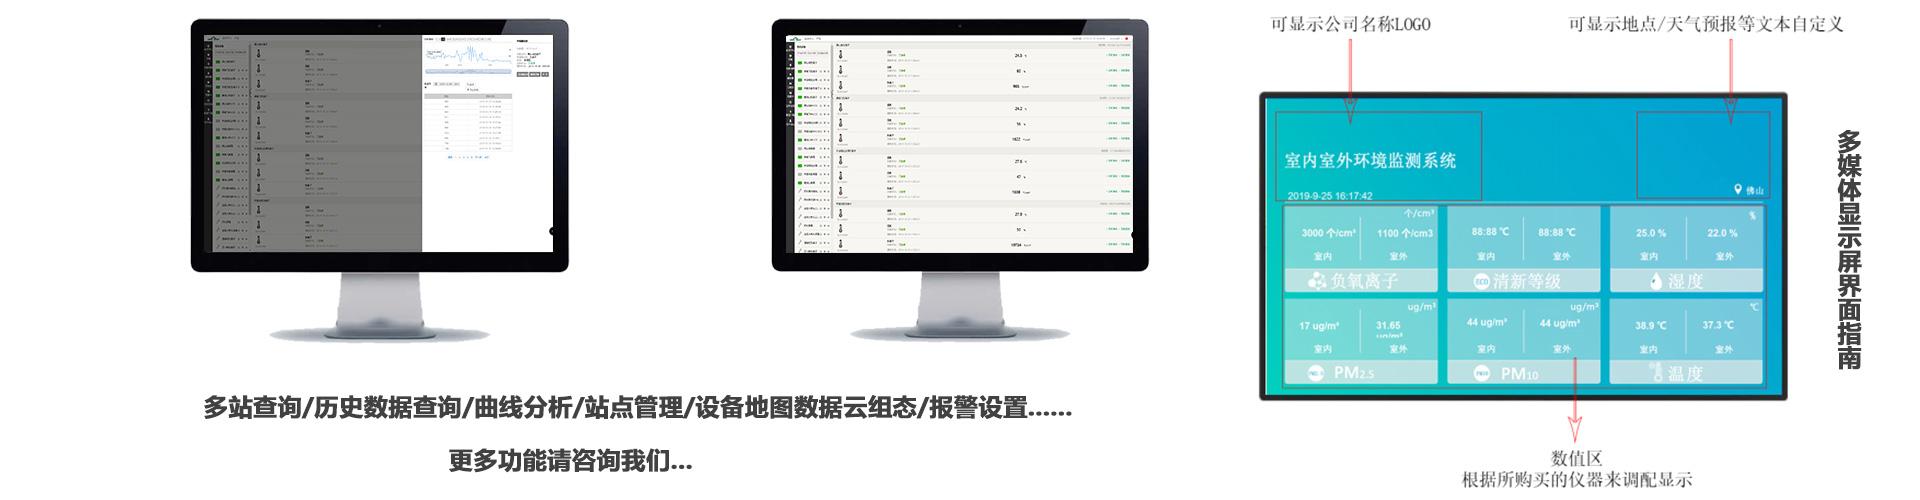 qy88千嬴国际官网物联网平台